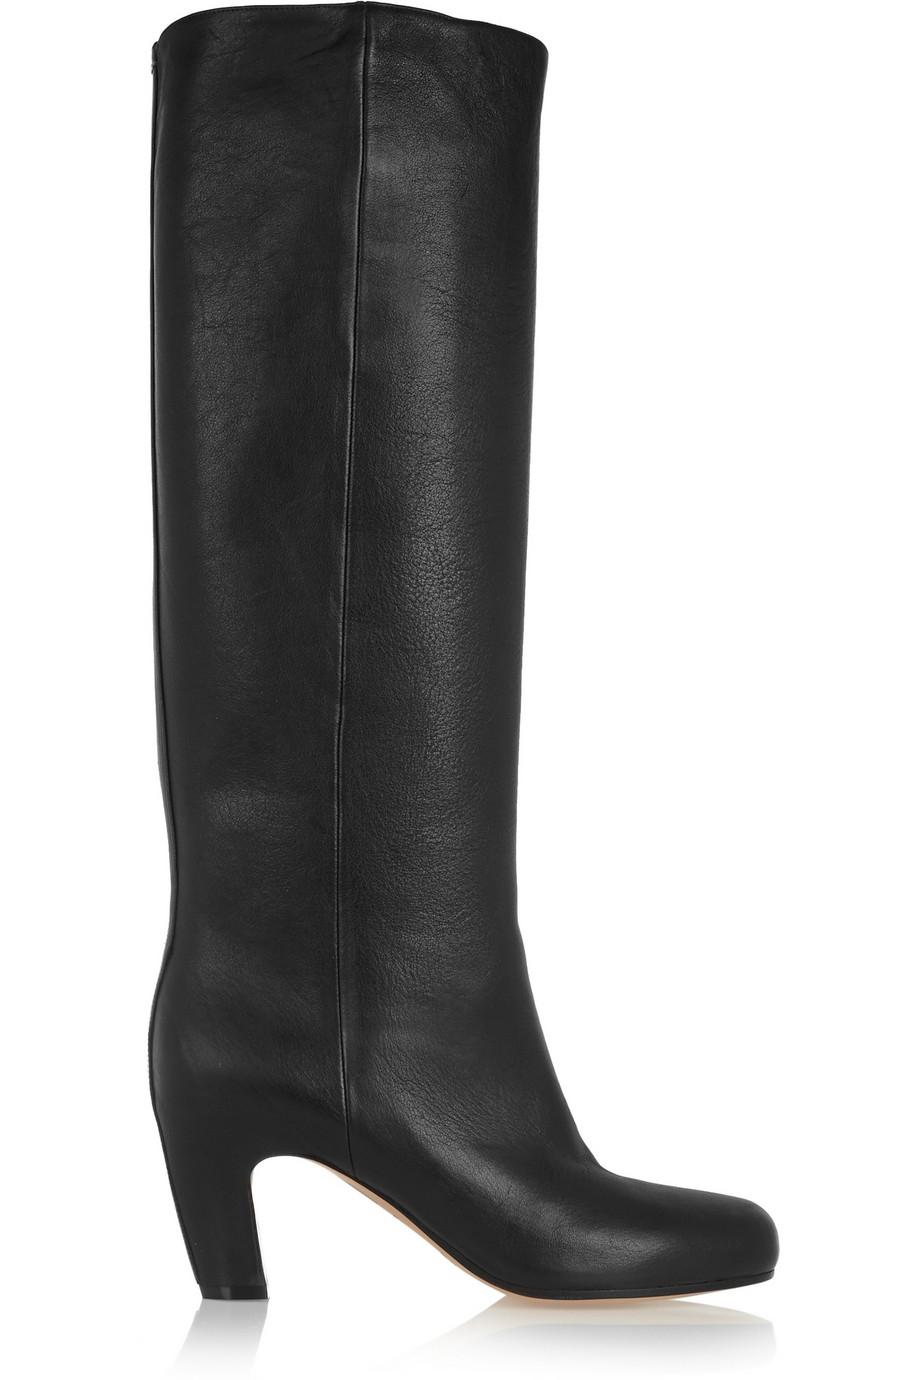 Maison martin margiela leather knee boots in black lyst for Maison martin margiela